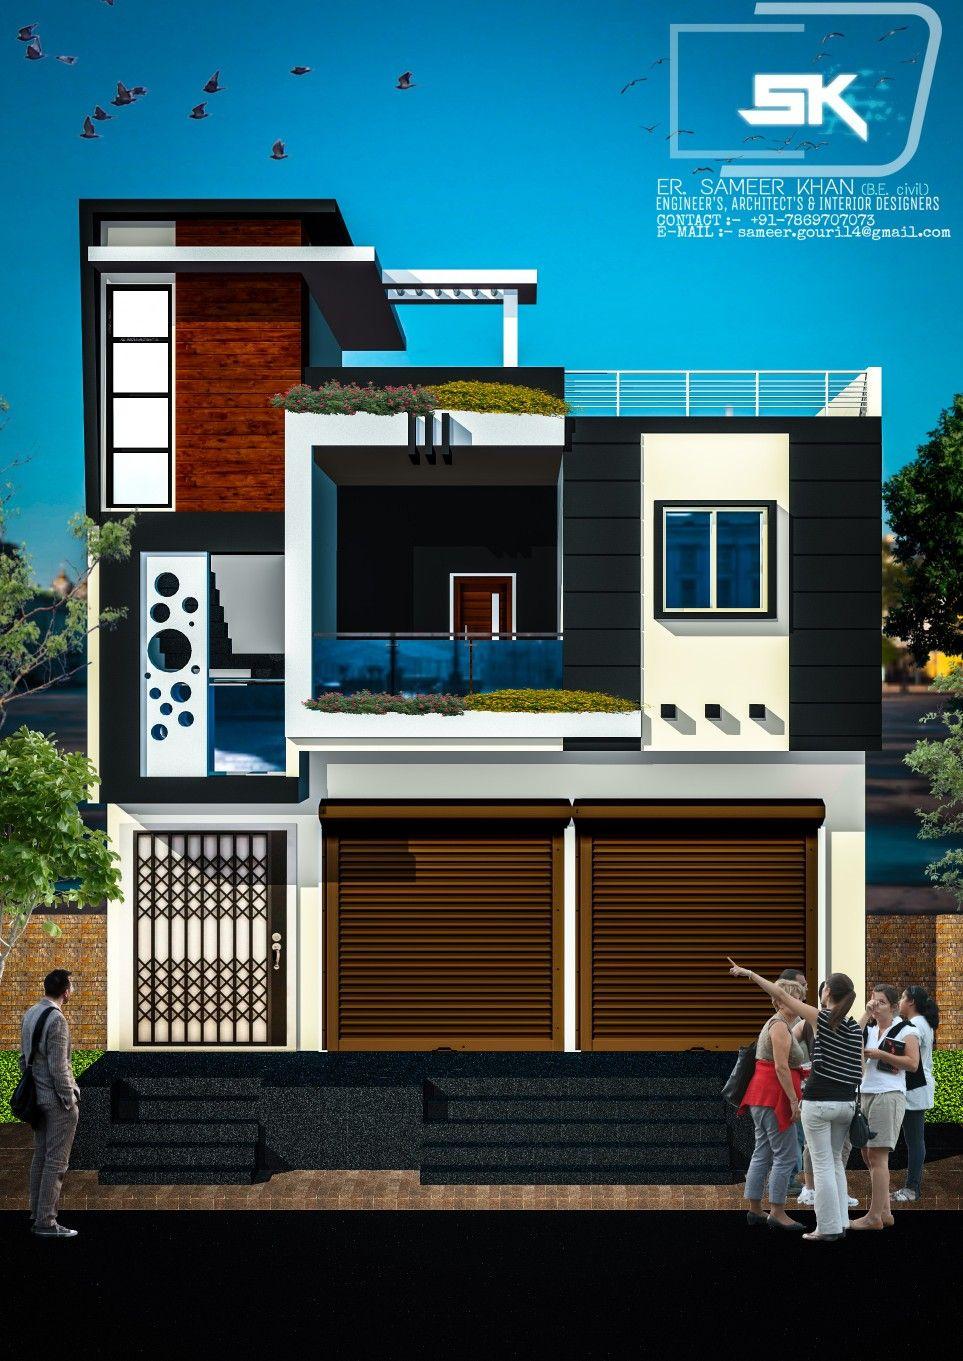 Modern House Trending Exterior Elevation With Shop By Er Sameer Khan Modern House Exterior Modern House House Designs Exterior